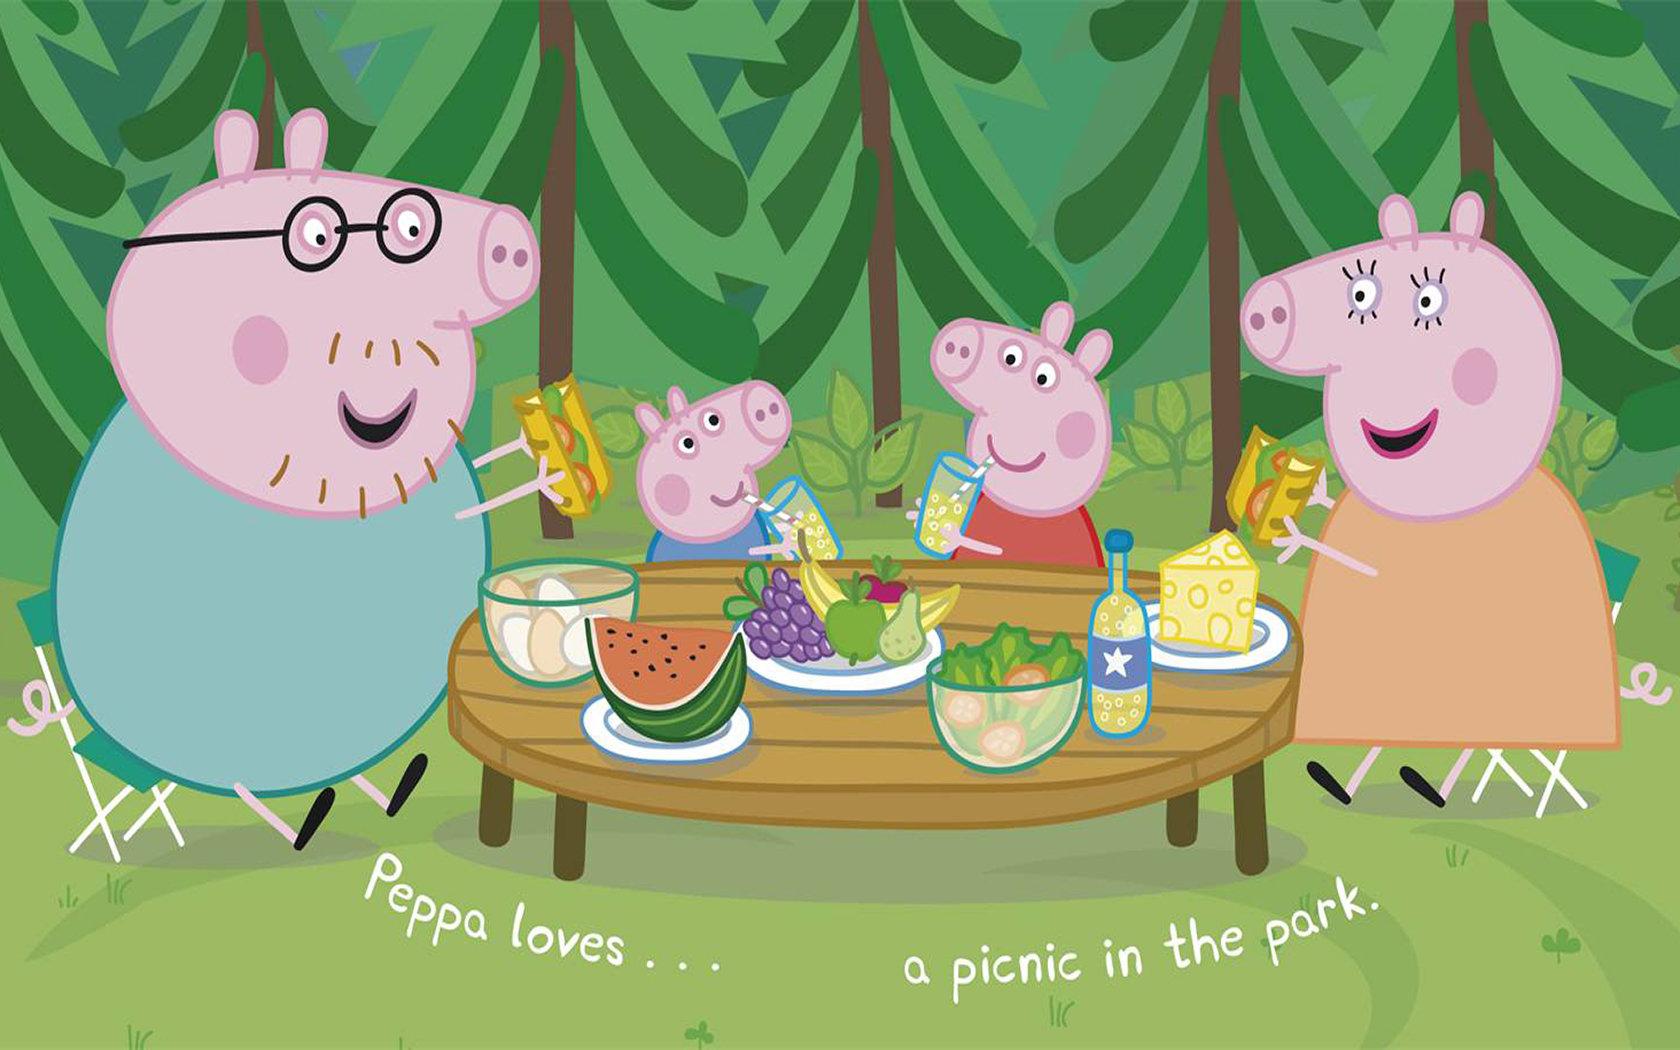 Free download Peppa Pig wallpaper ID:315219 hd 1680x1050 for desktop